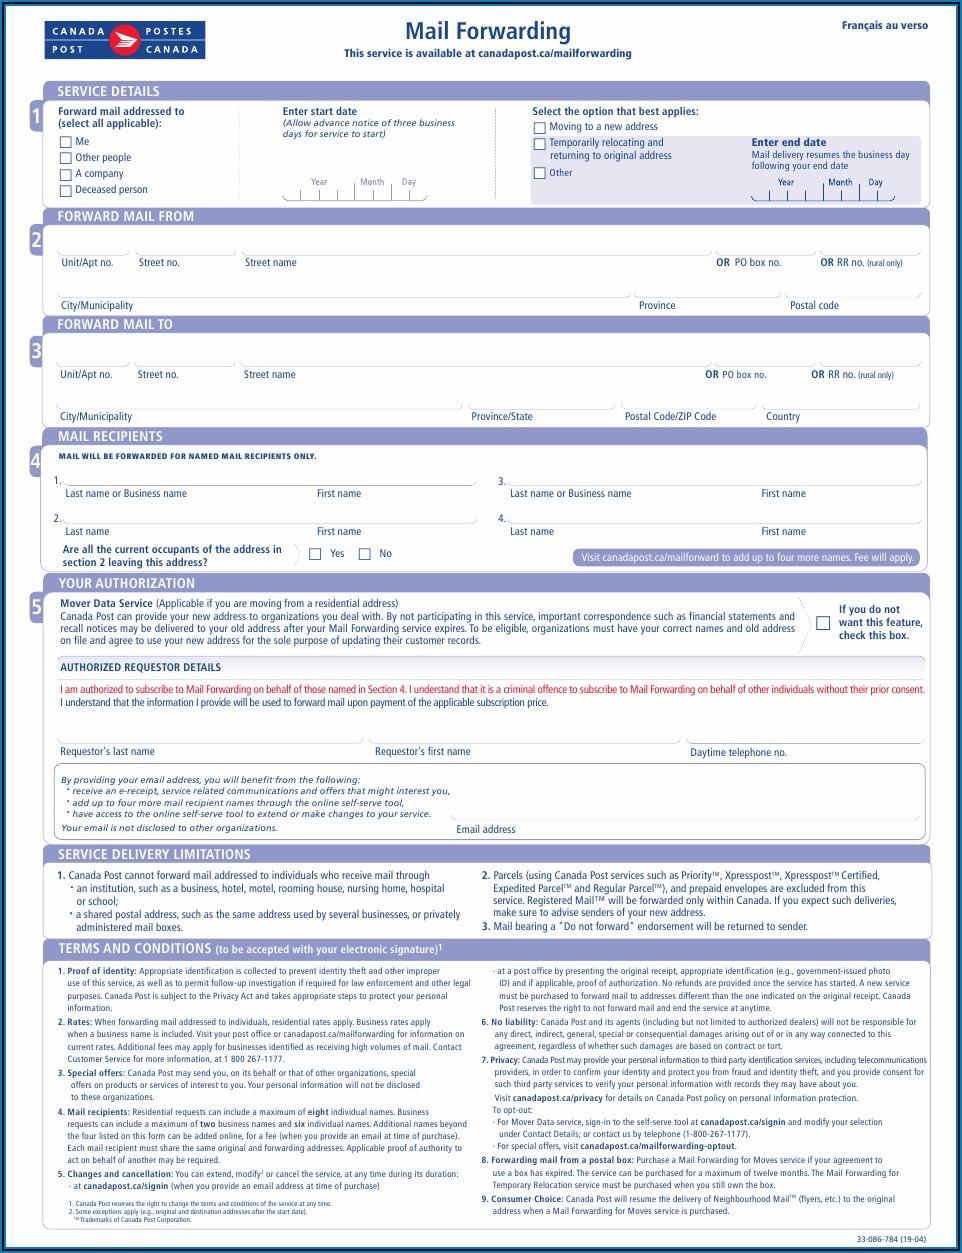 Self Addressed Prepaid Envelope Canada Post